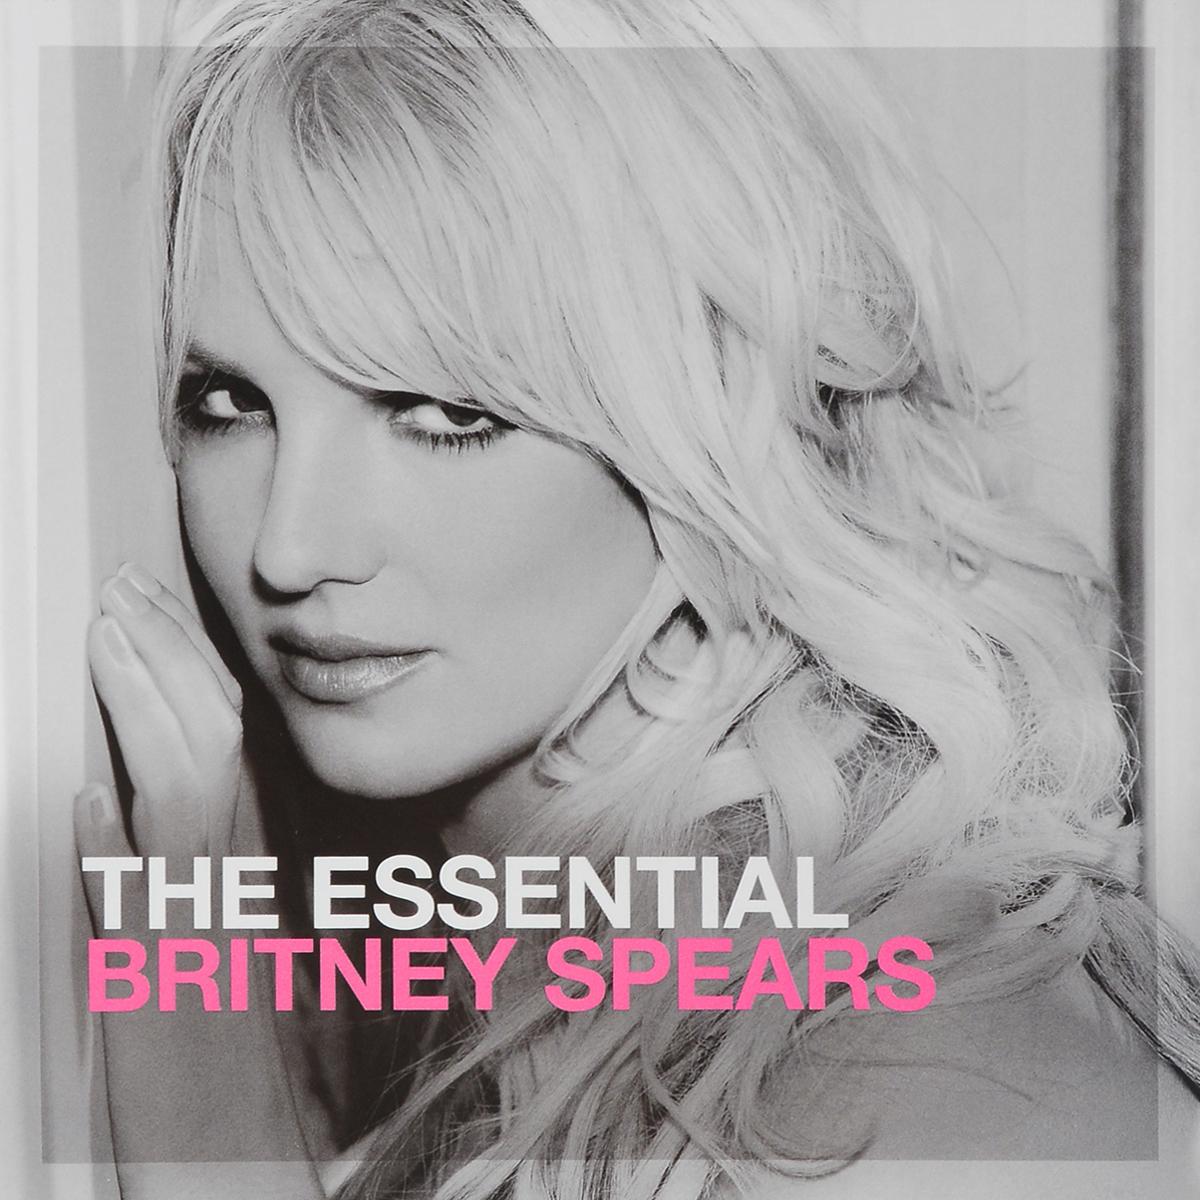 Бритни Спирс Britney Spears. The Essential цена и фото